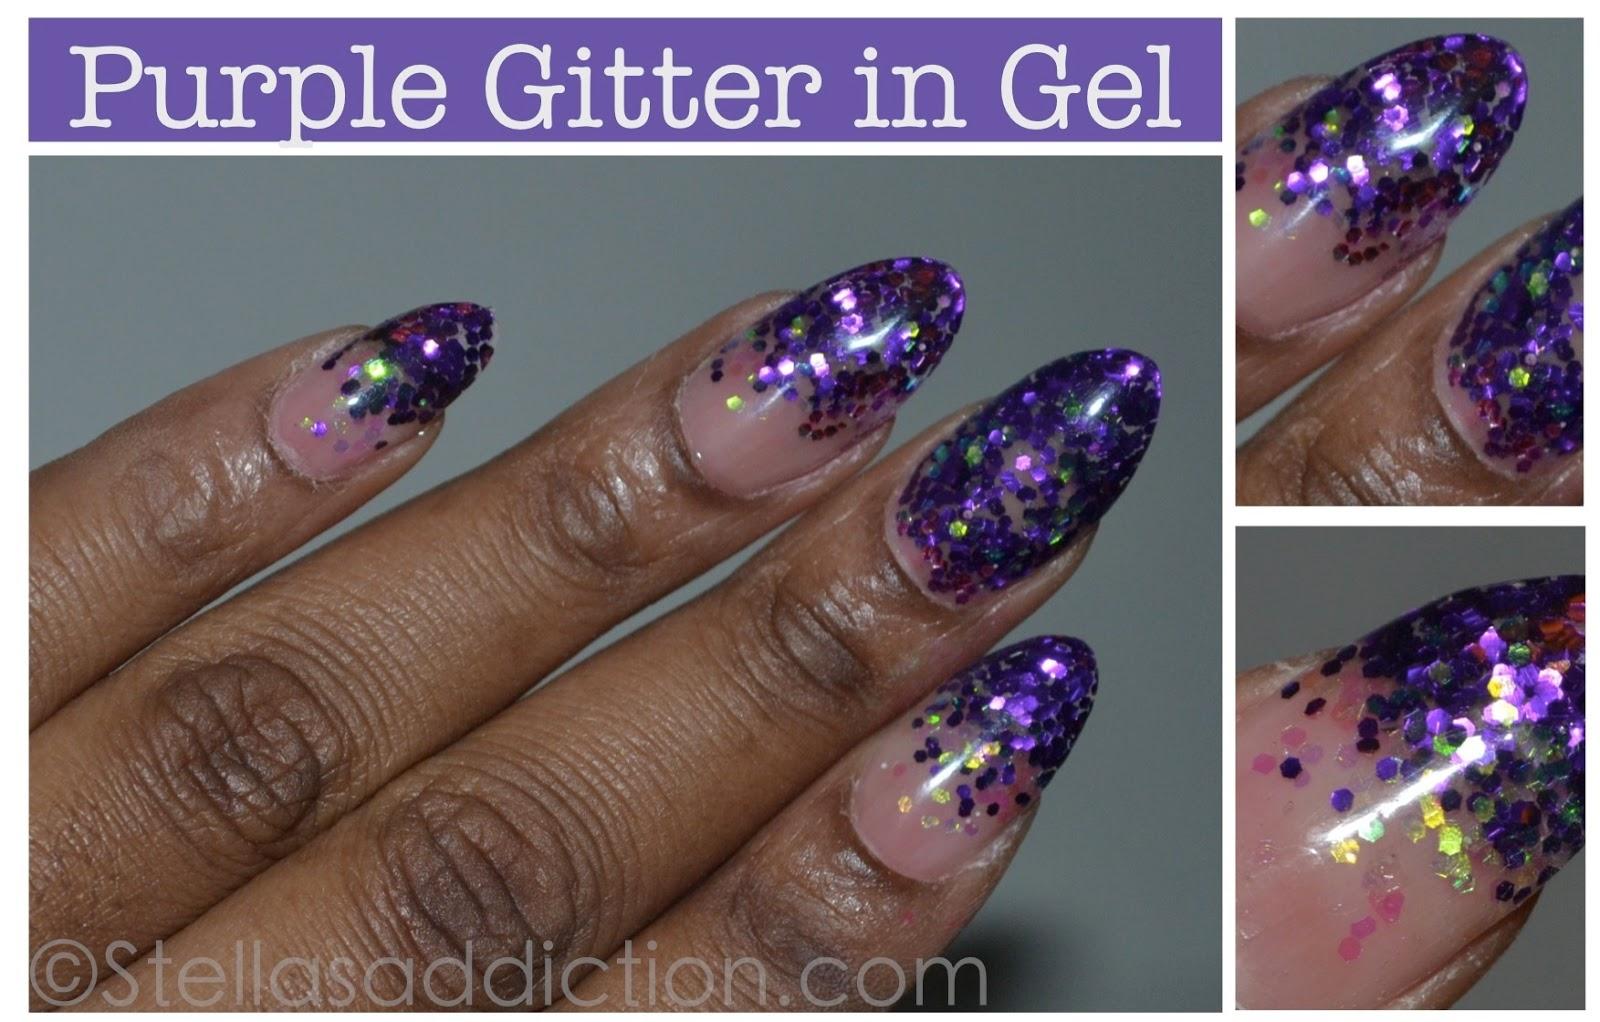 Notd Purple Glitter In Gel Nail Art Stellas Addiction